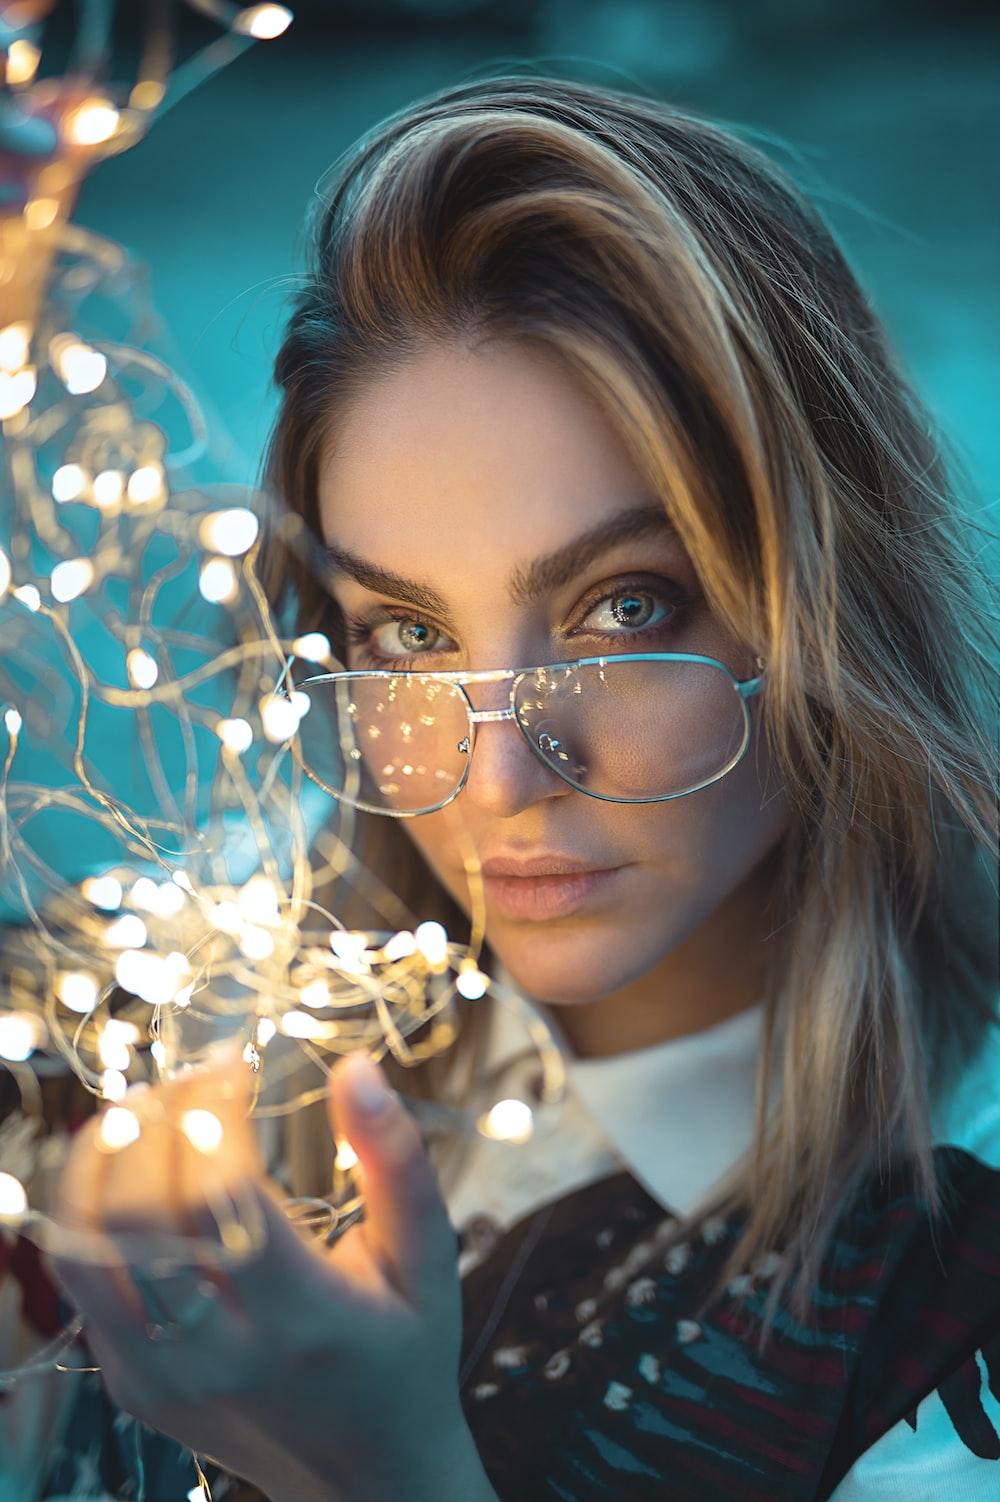 woman wearing eyeglasses holding white string lights